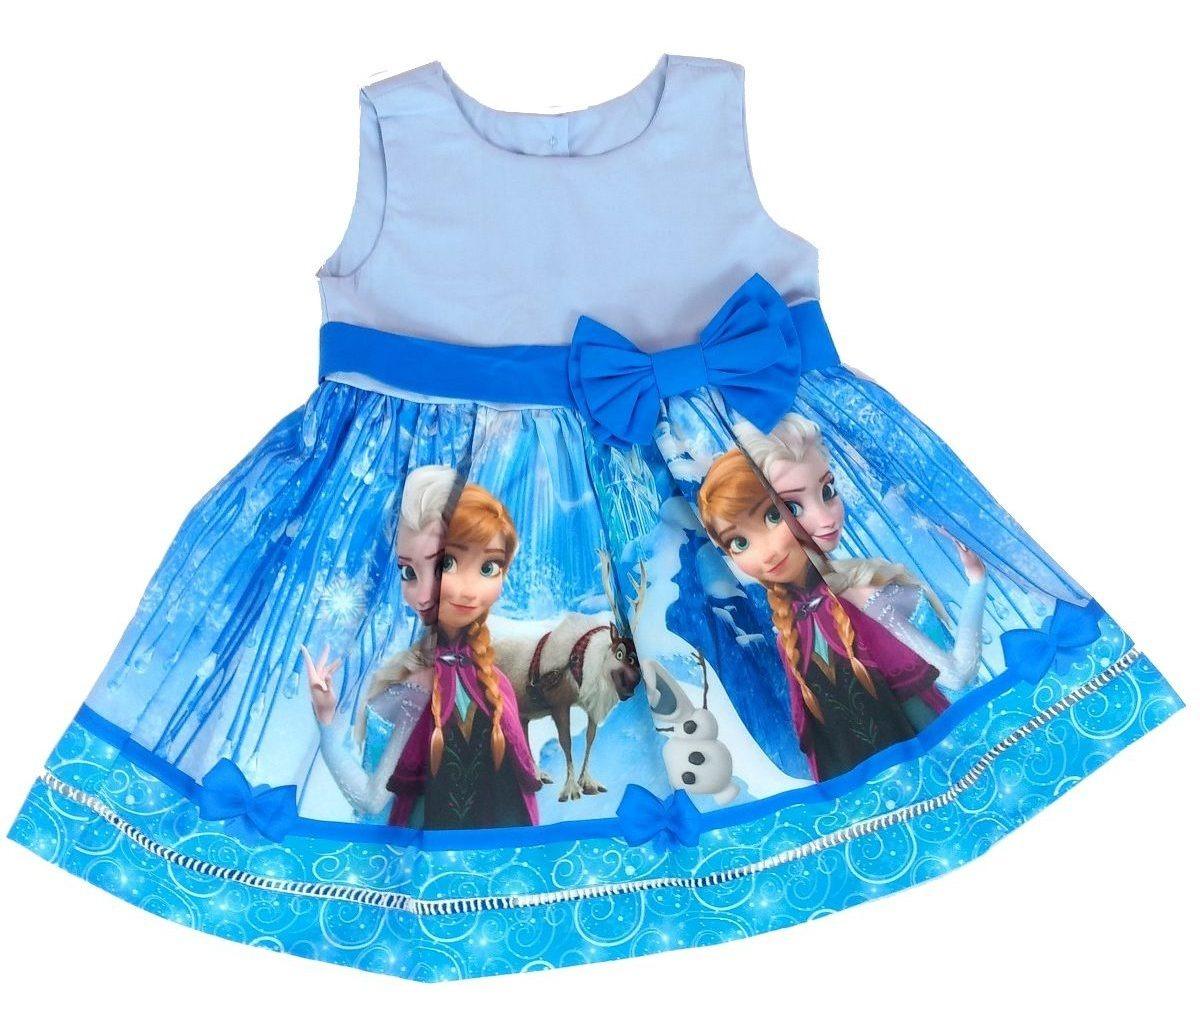 79e095618 vestido infantil frozen ana elsa e olaf gelo festa infantil. Carregando  zoom.